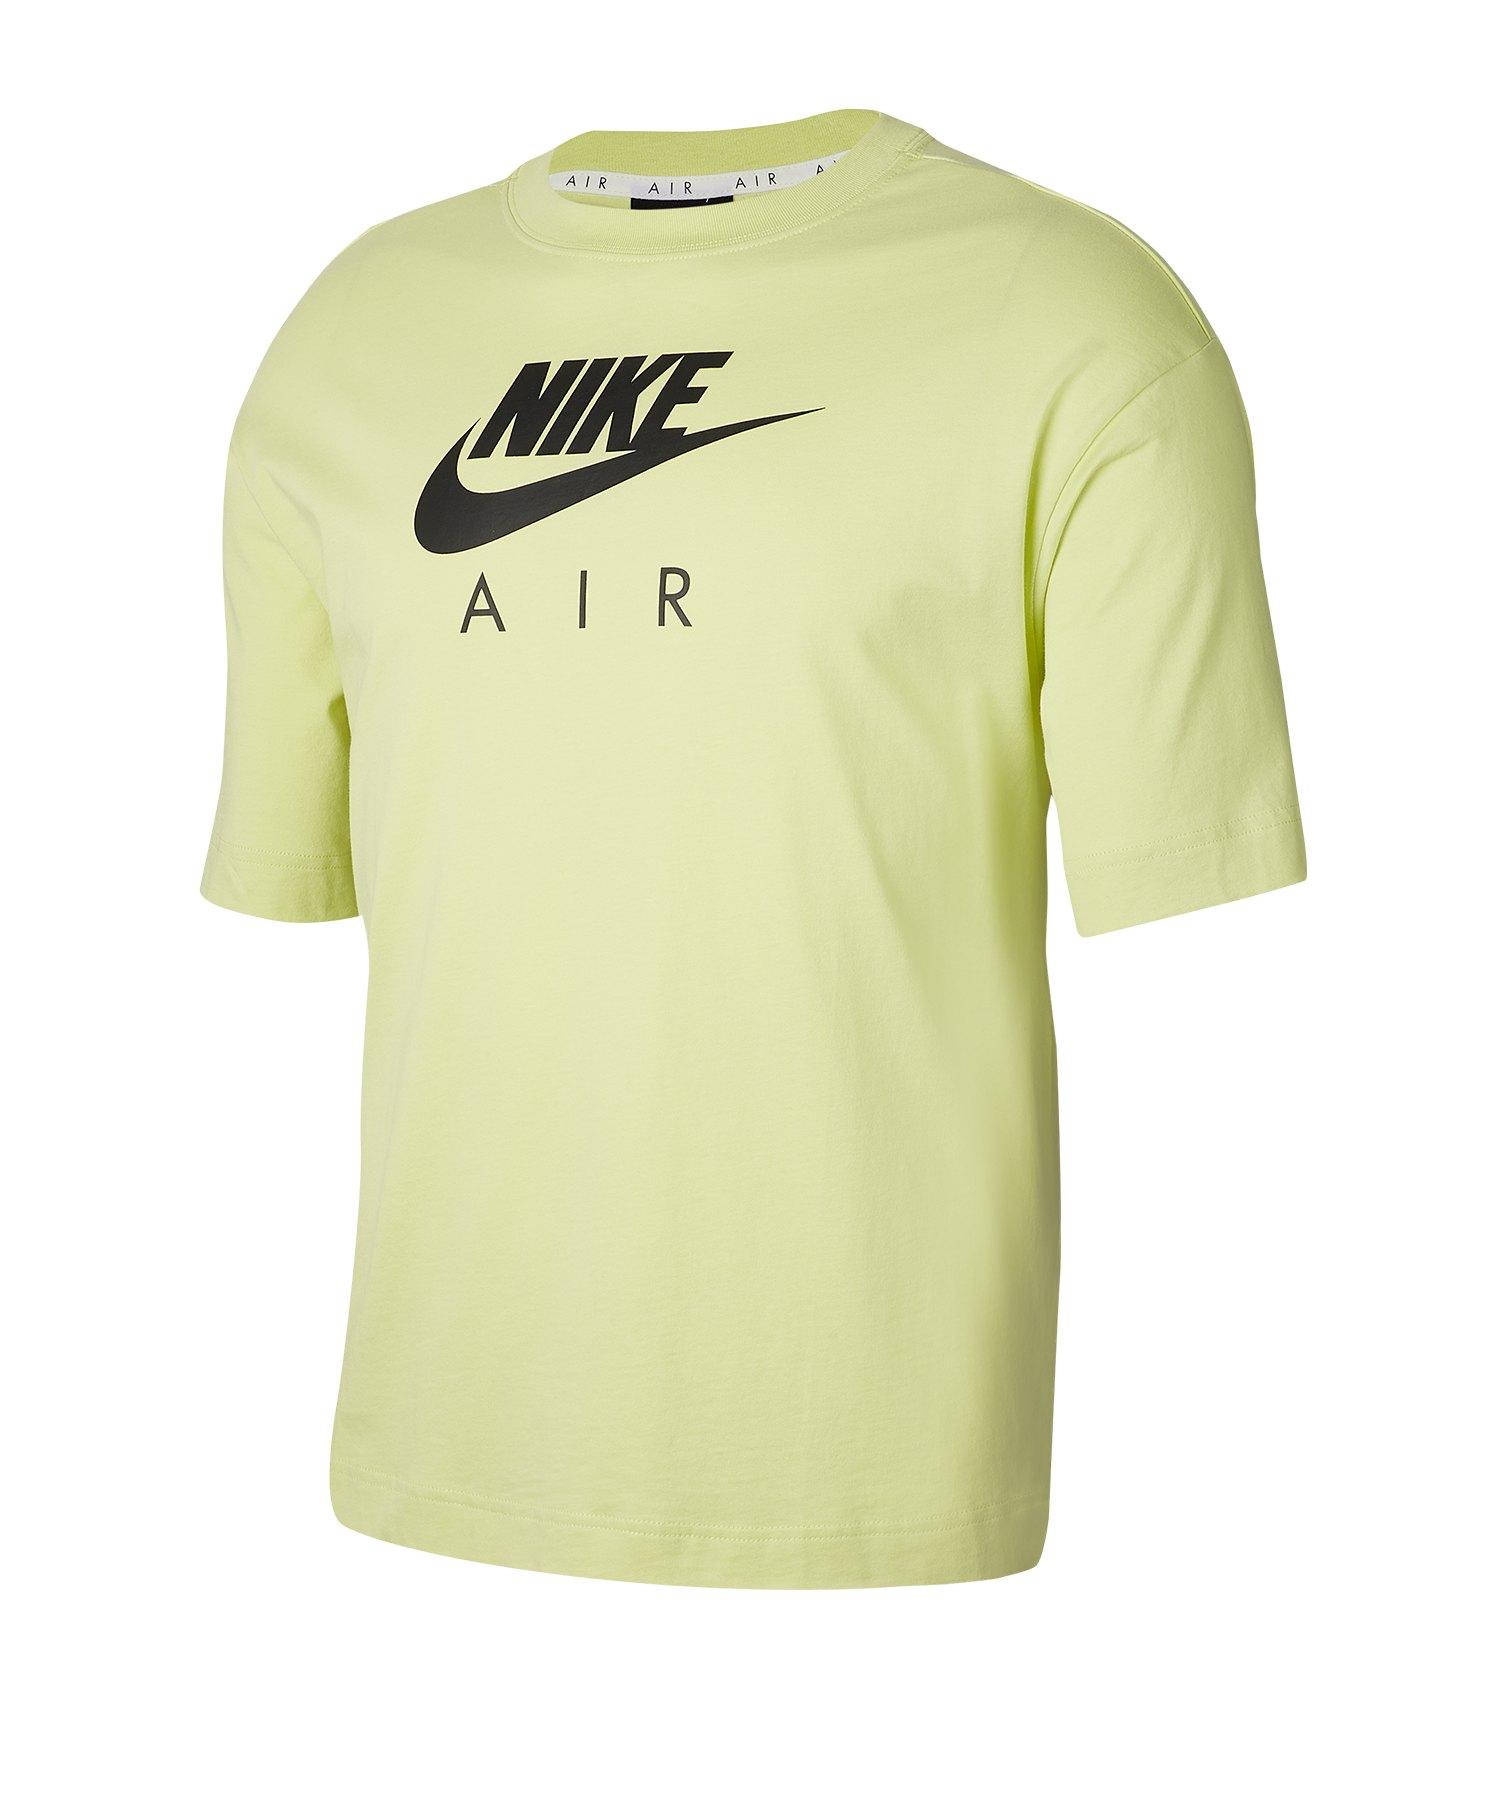 Nike Air T-Shirt Damen Grün F367 - gruen